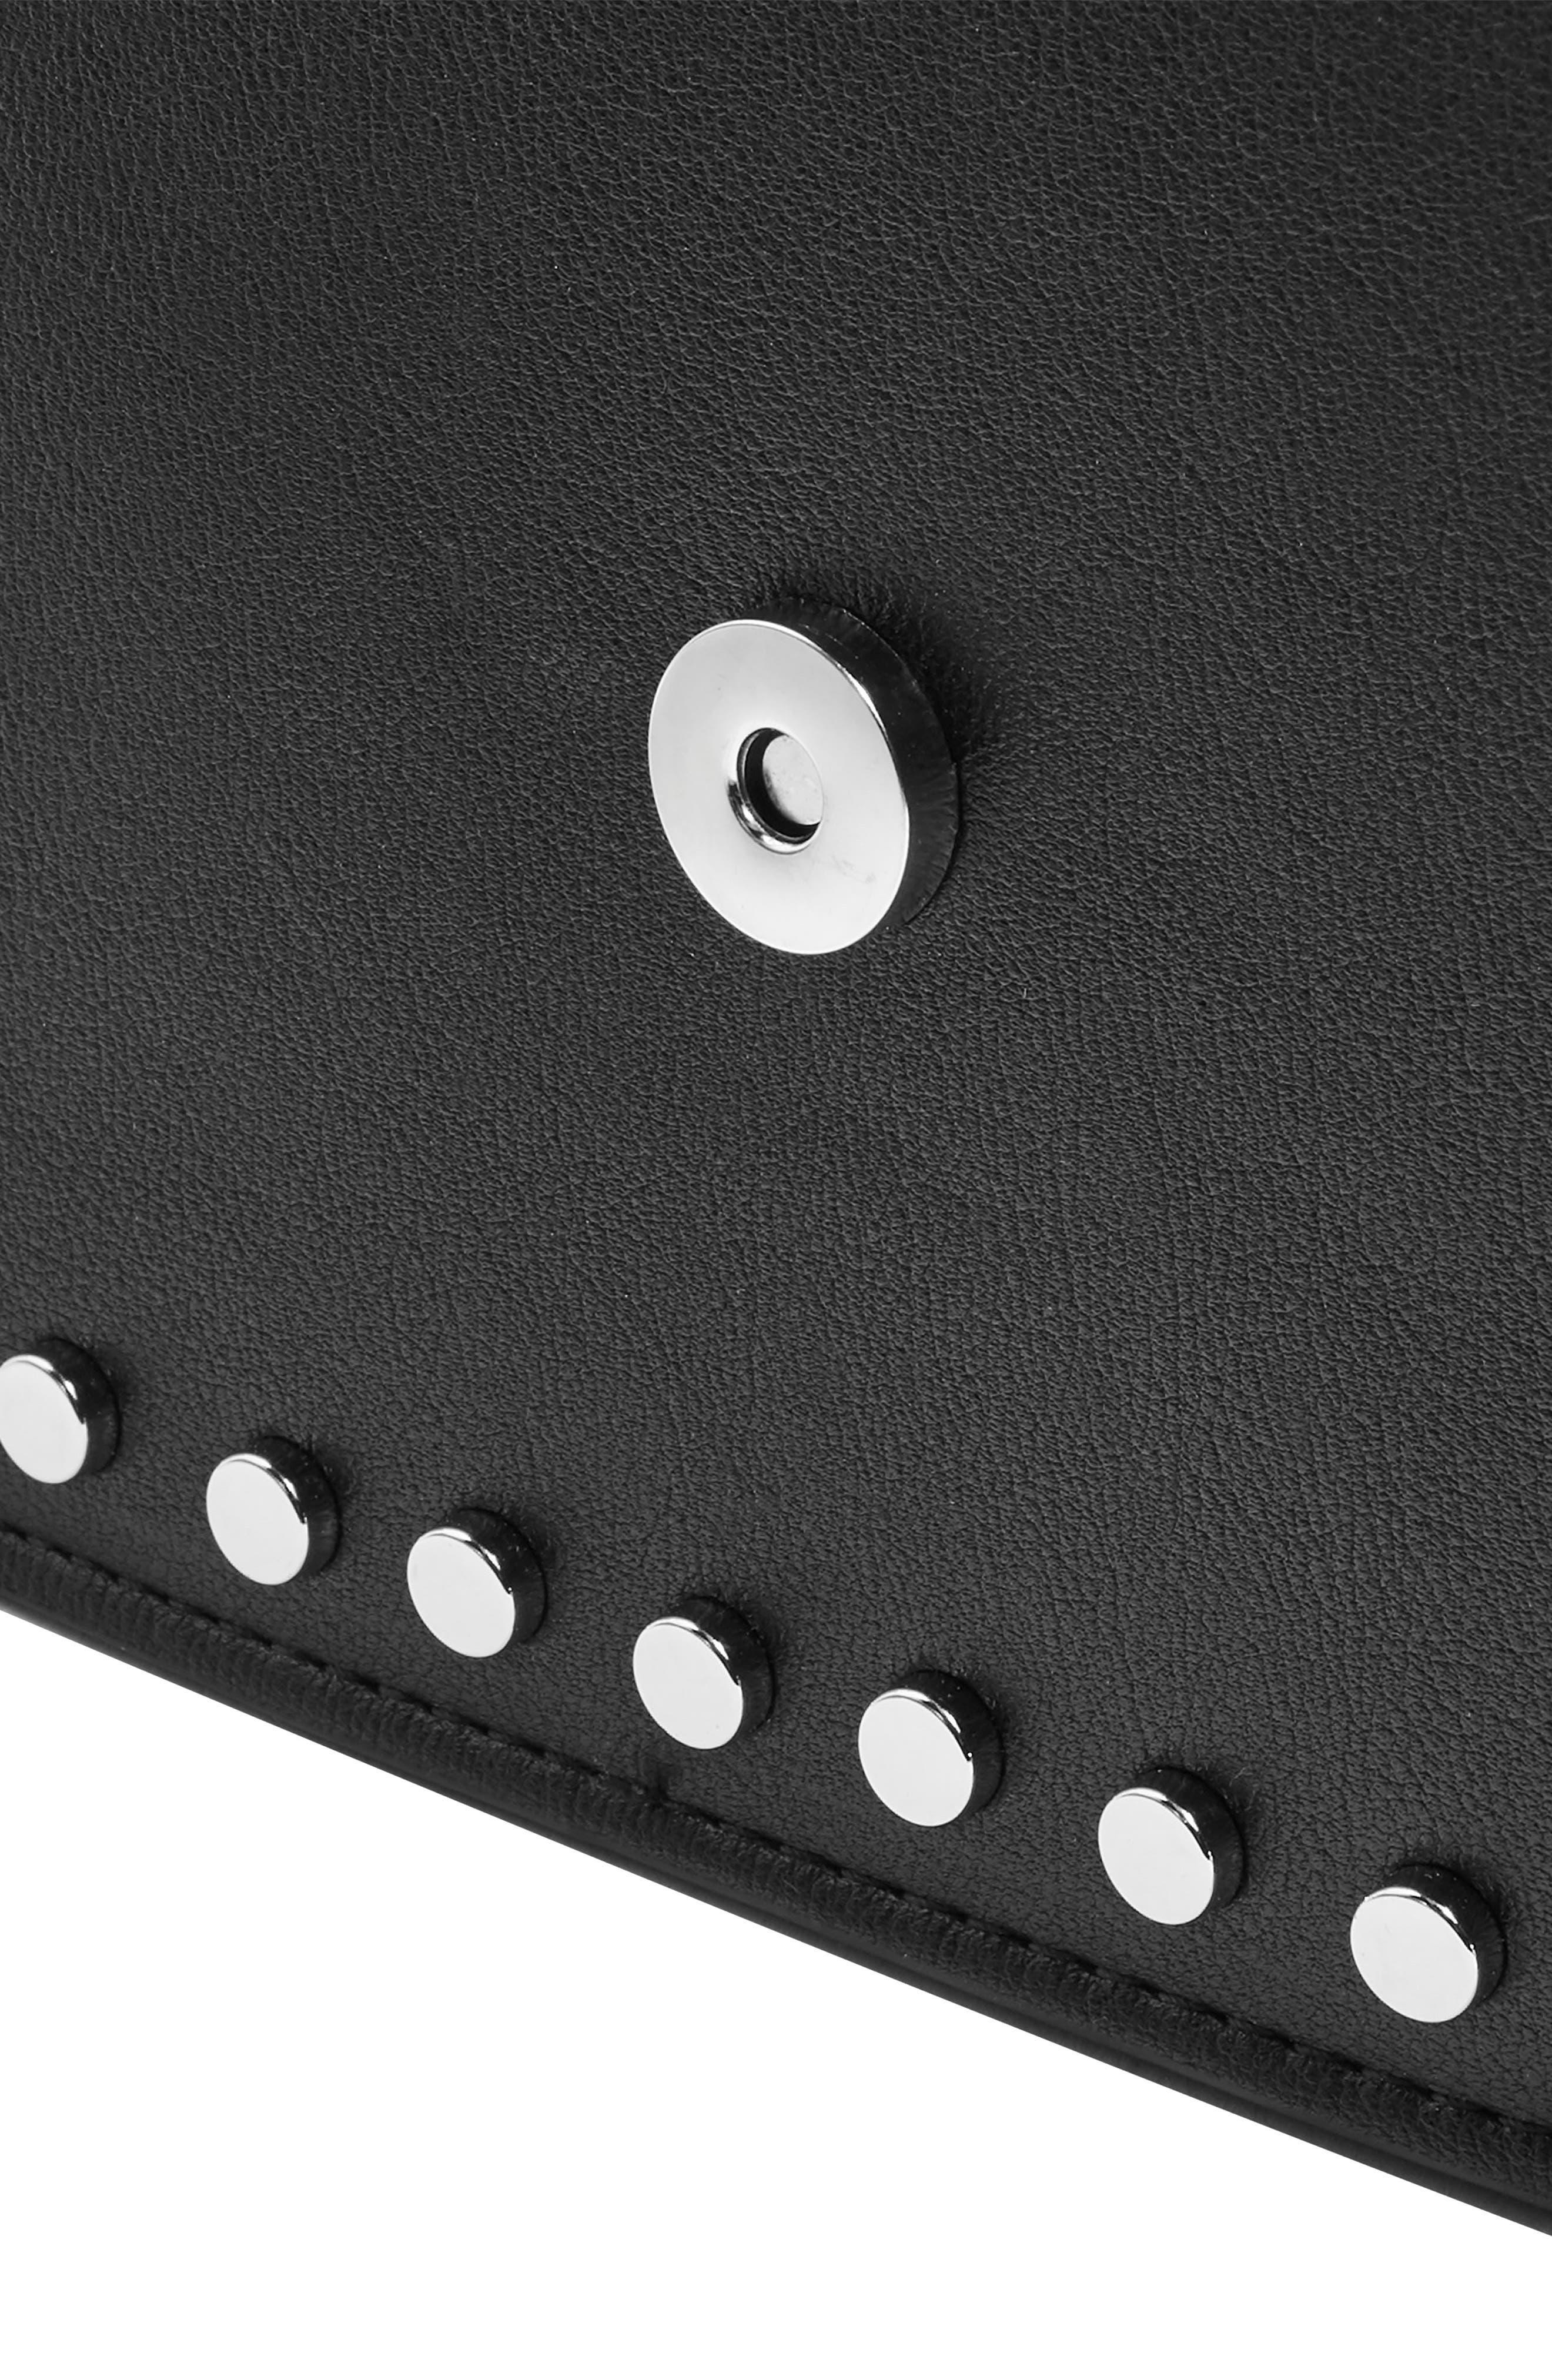 Buckle Faux Leather Crossbody Bag,                             Alternate thumbnail 3, color,                             BLACK